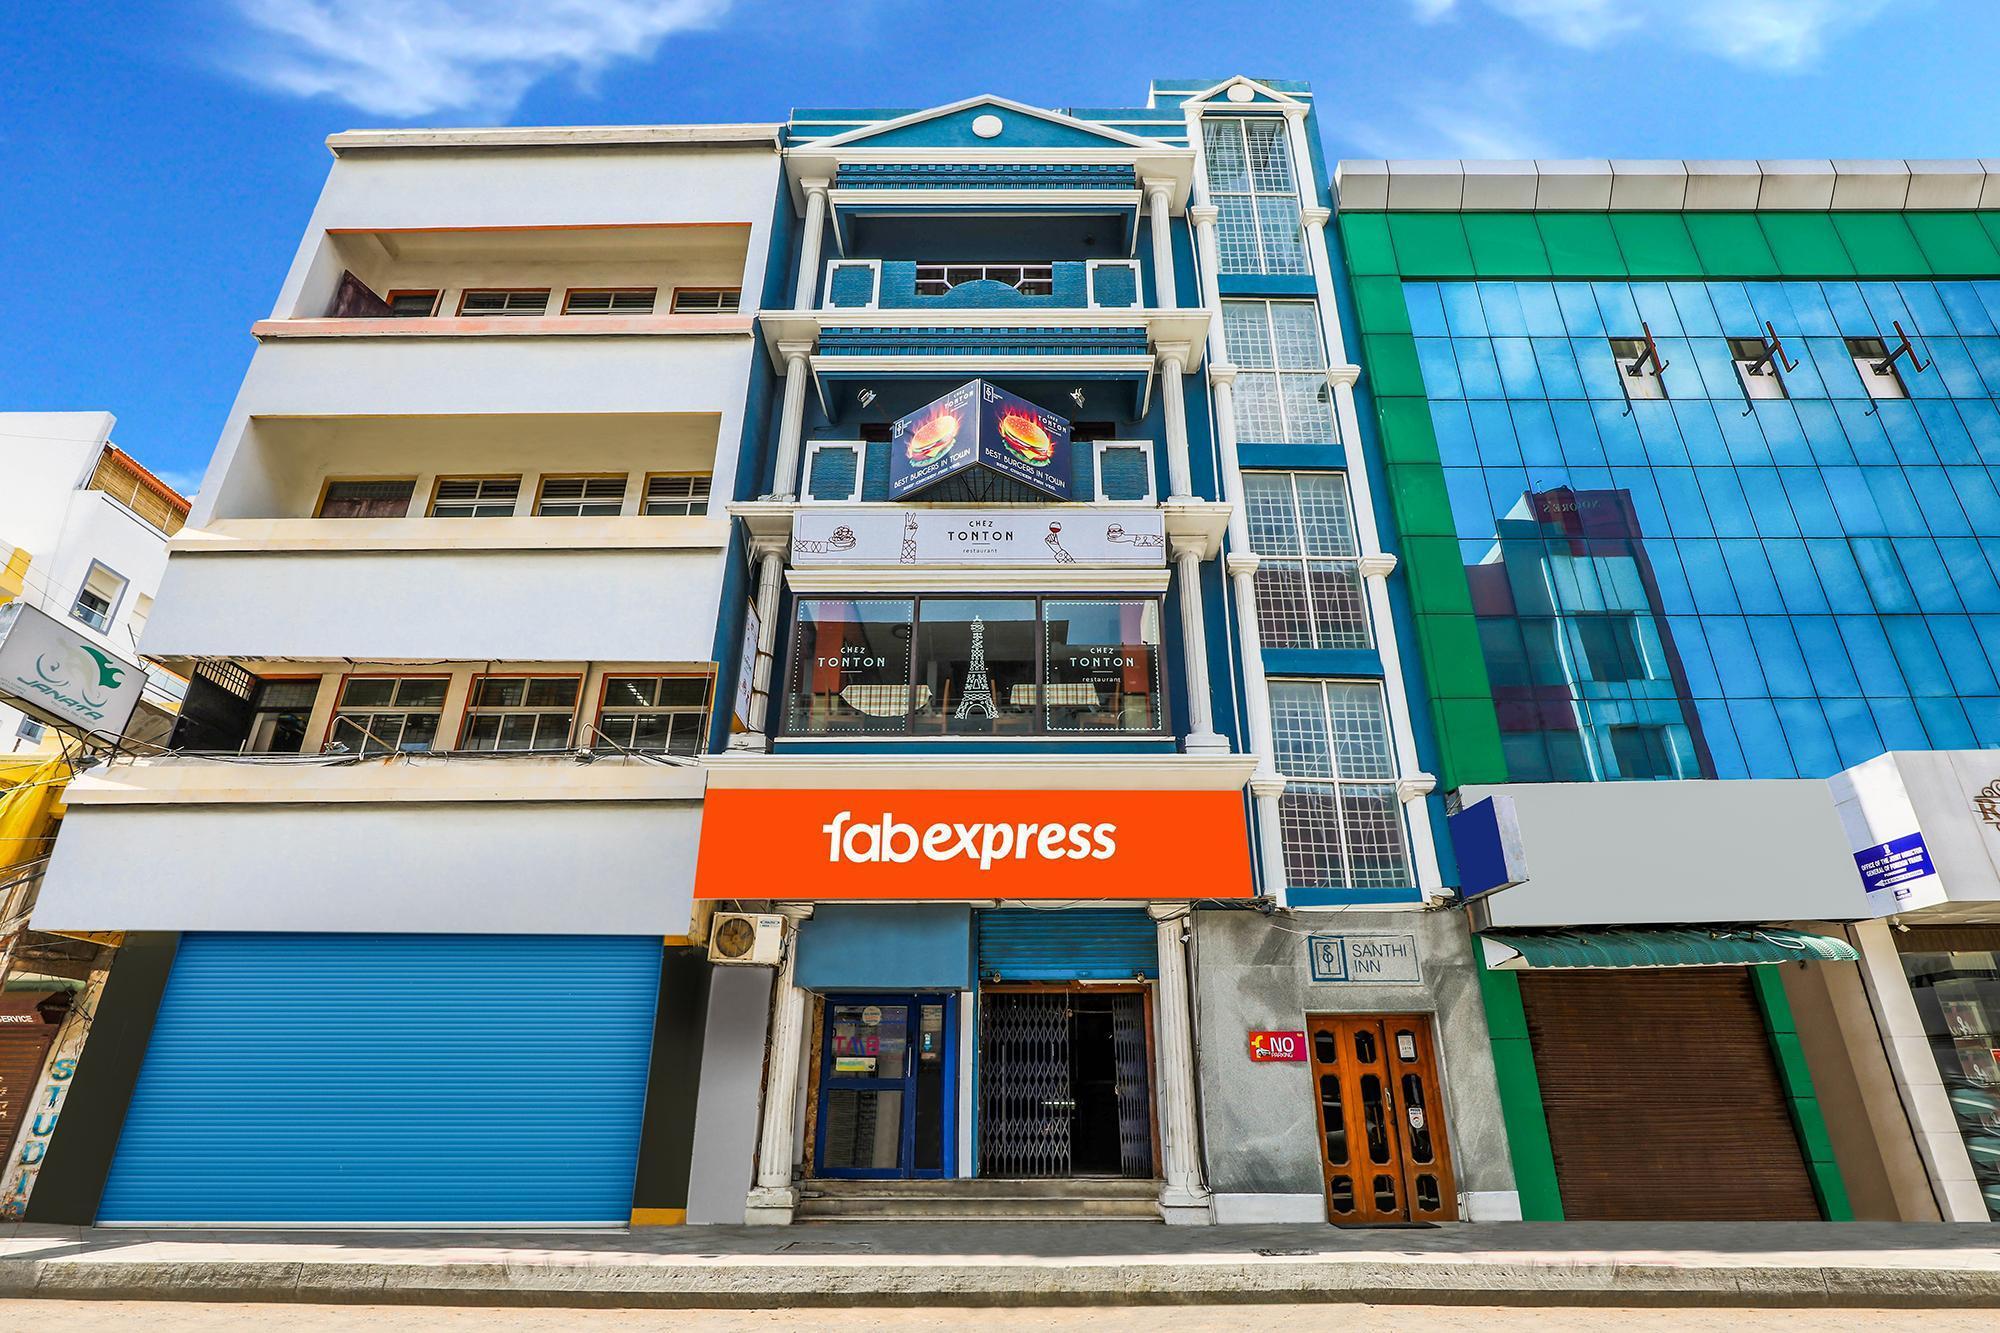 FabExpress Santhi Inn